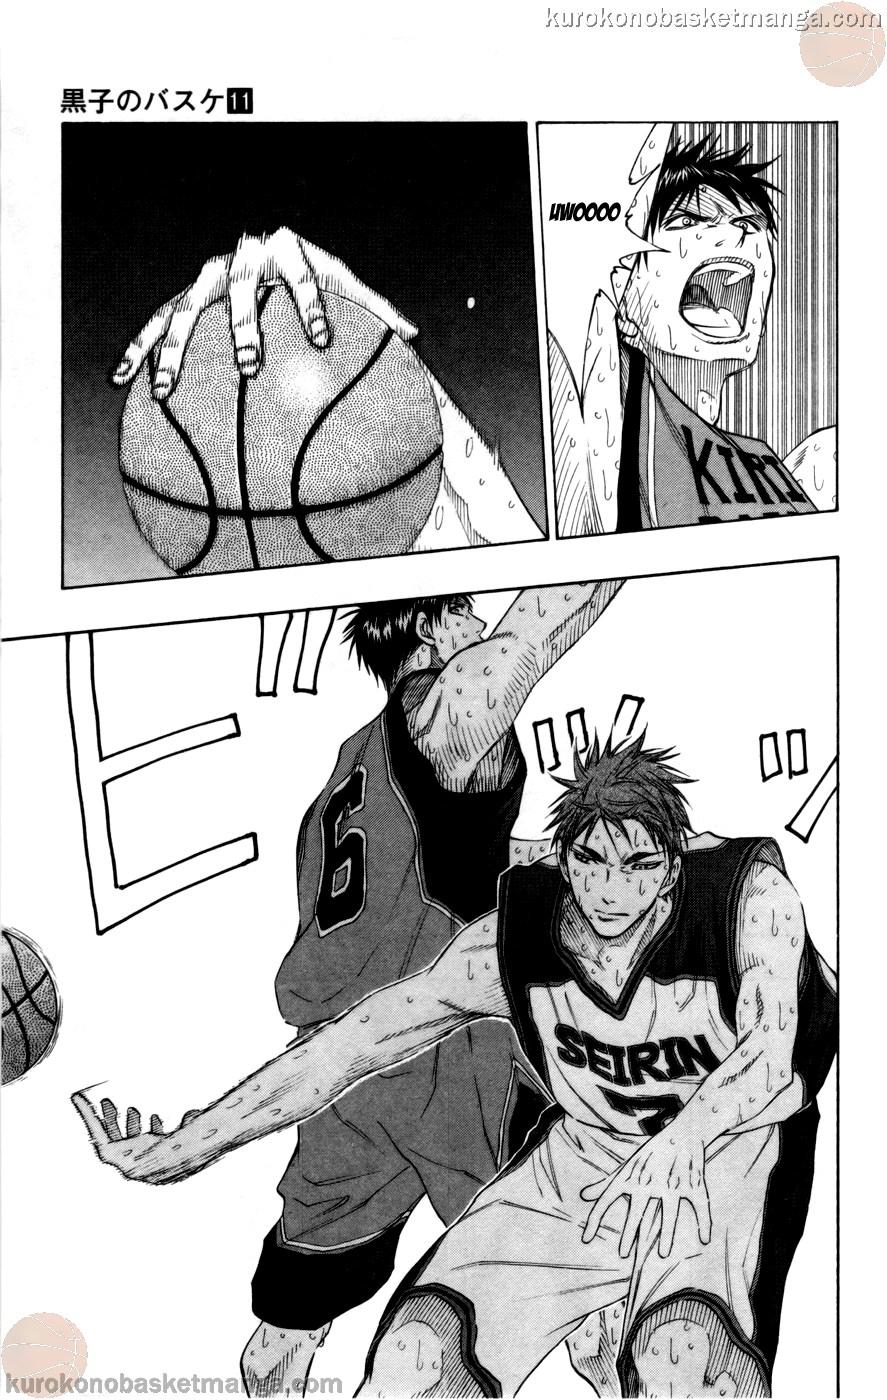 Kuroko no Basket Manga Chapter 98 - Image 14